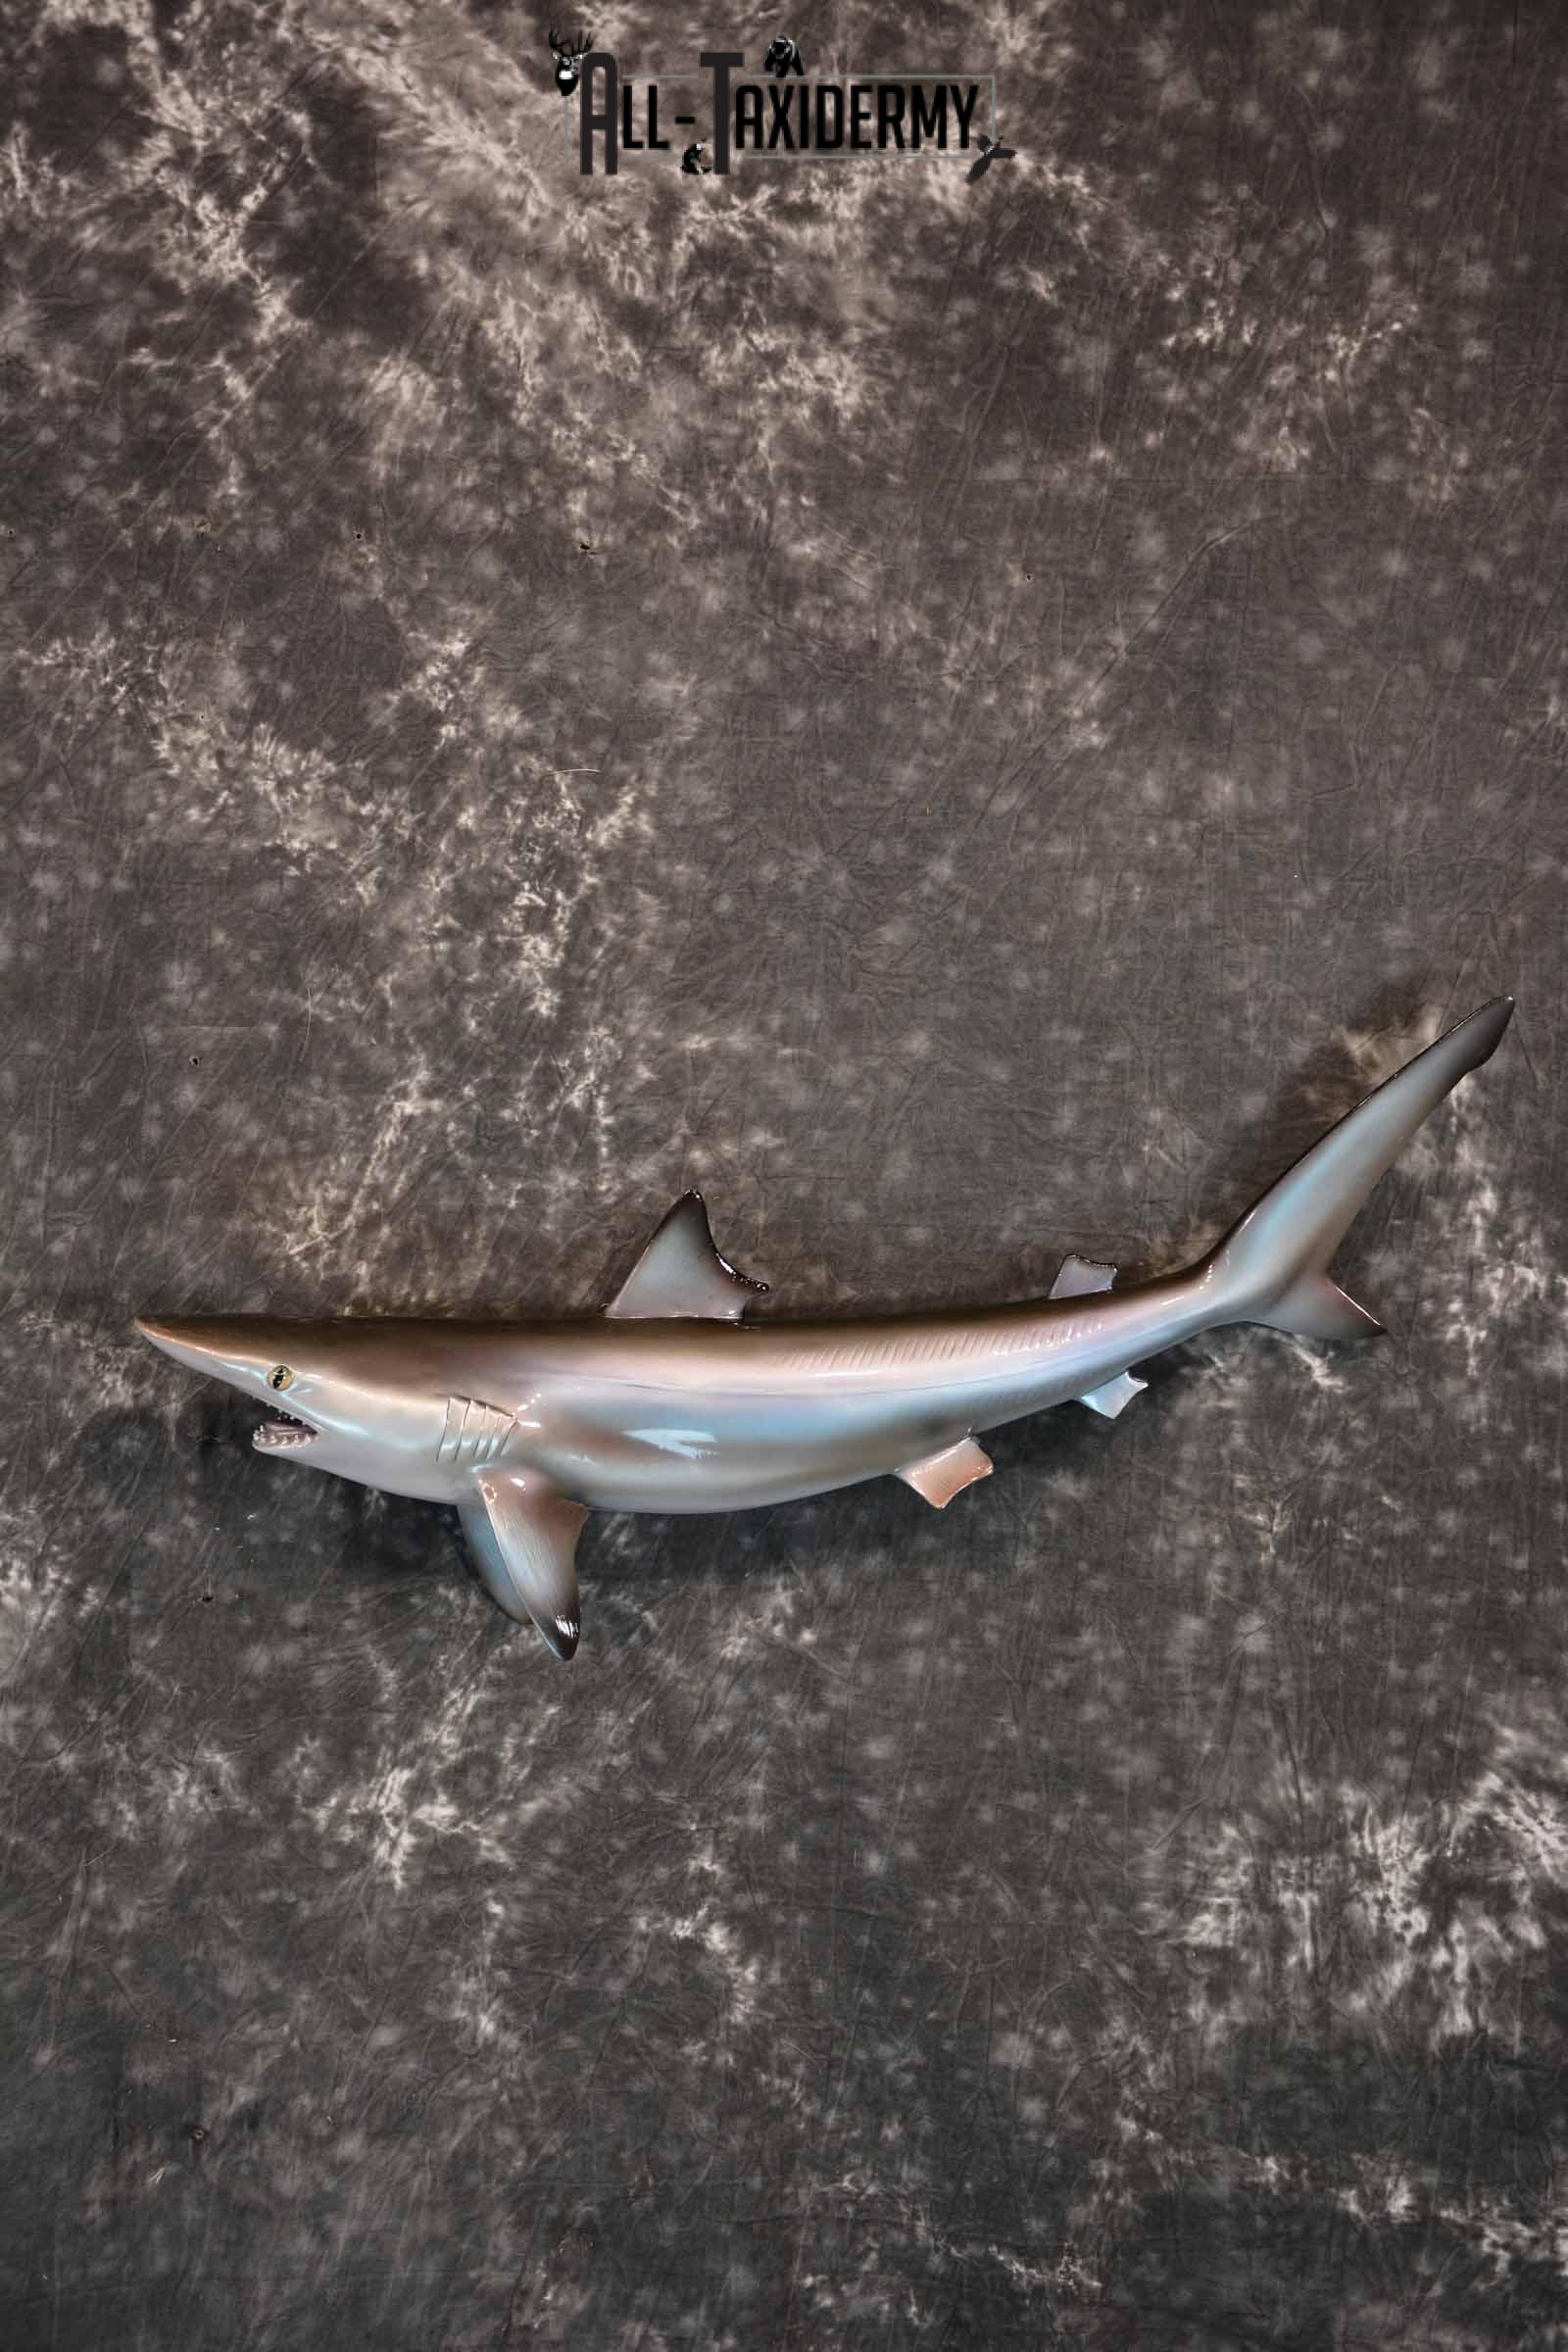 Sand Tiger Shark Replica Taxidermy Mount for Sale SKU 1303